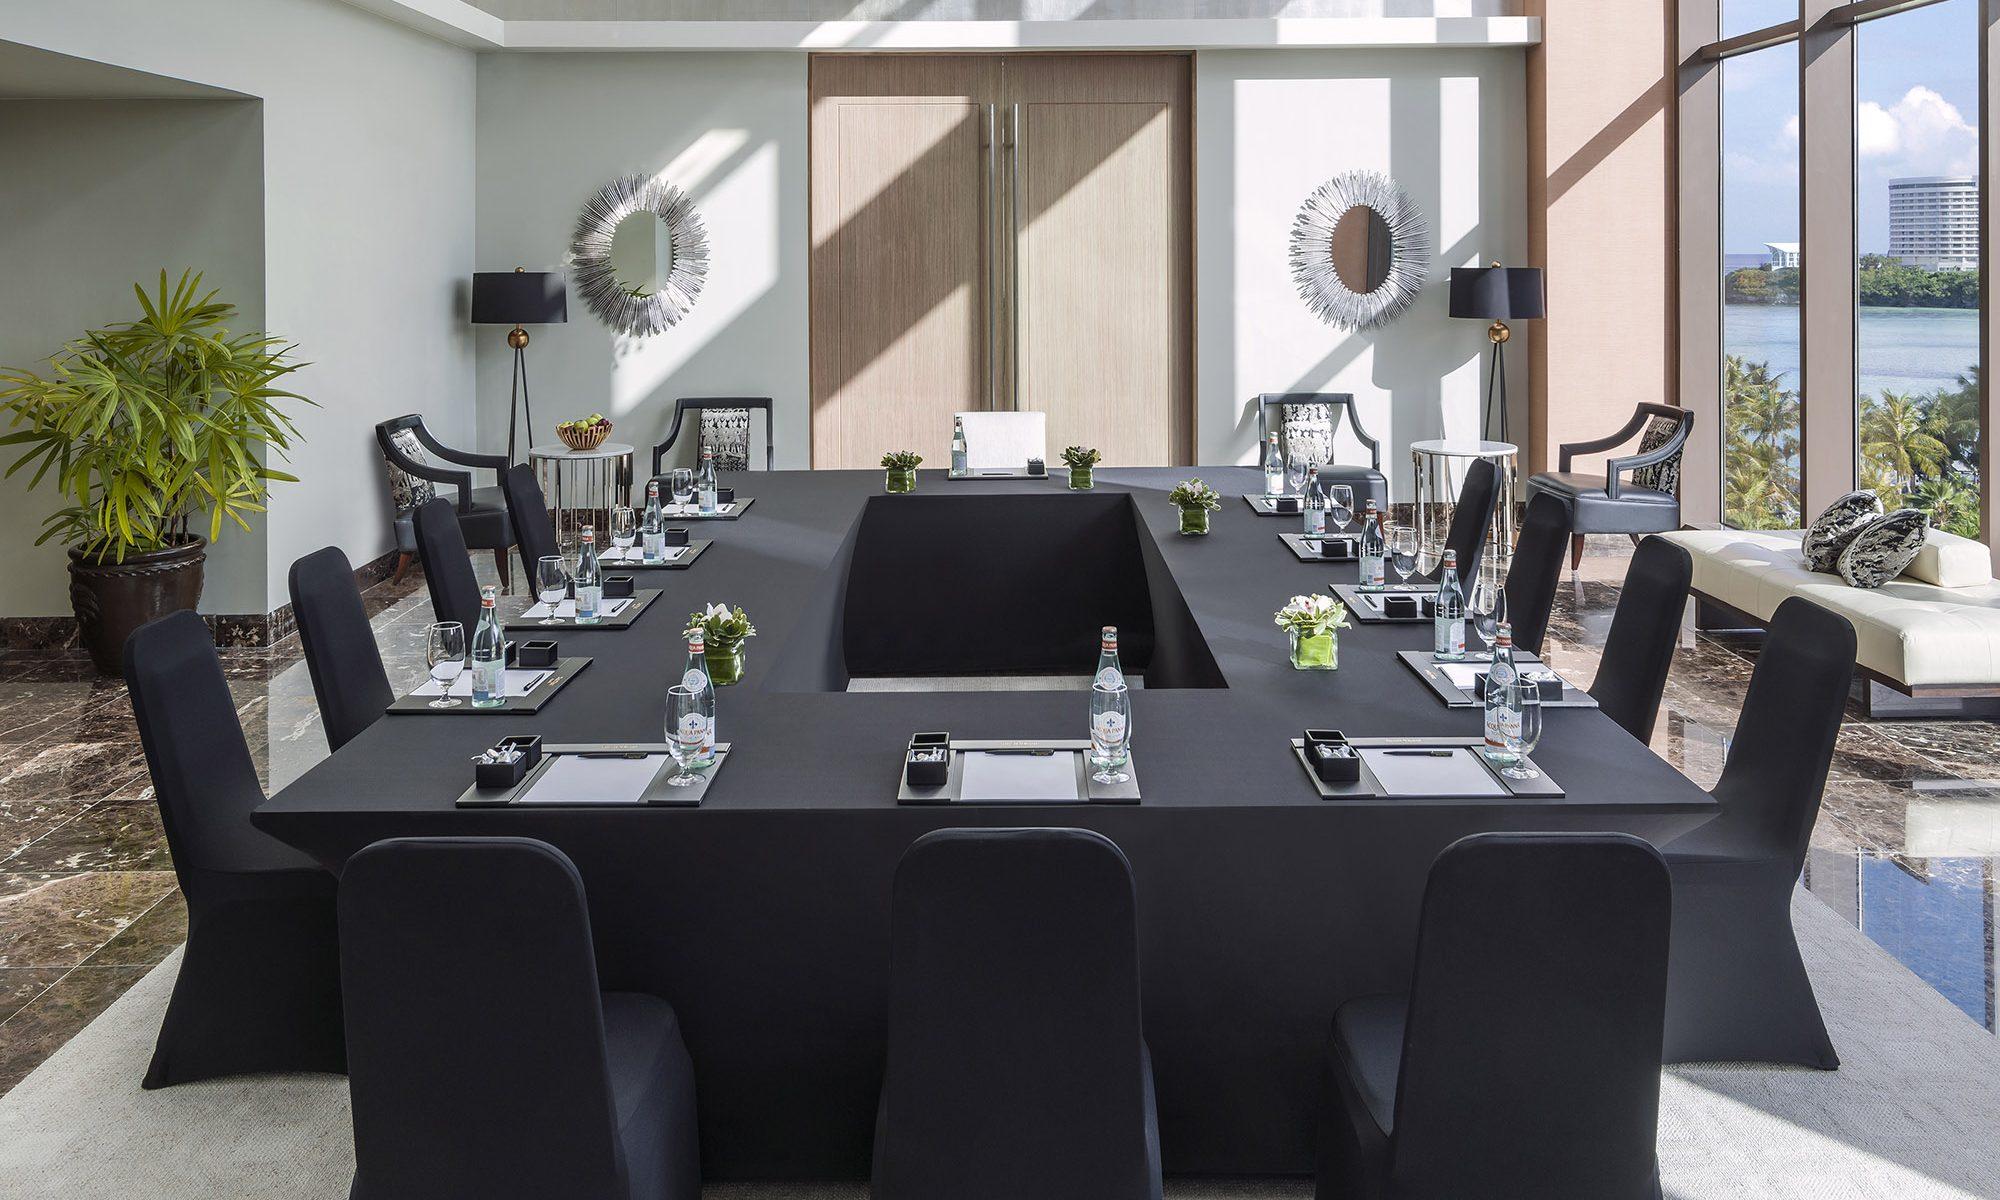 dusit thani guam resort - Salon meeting room